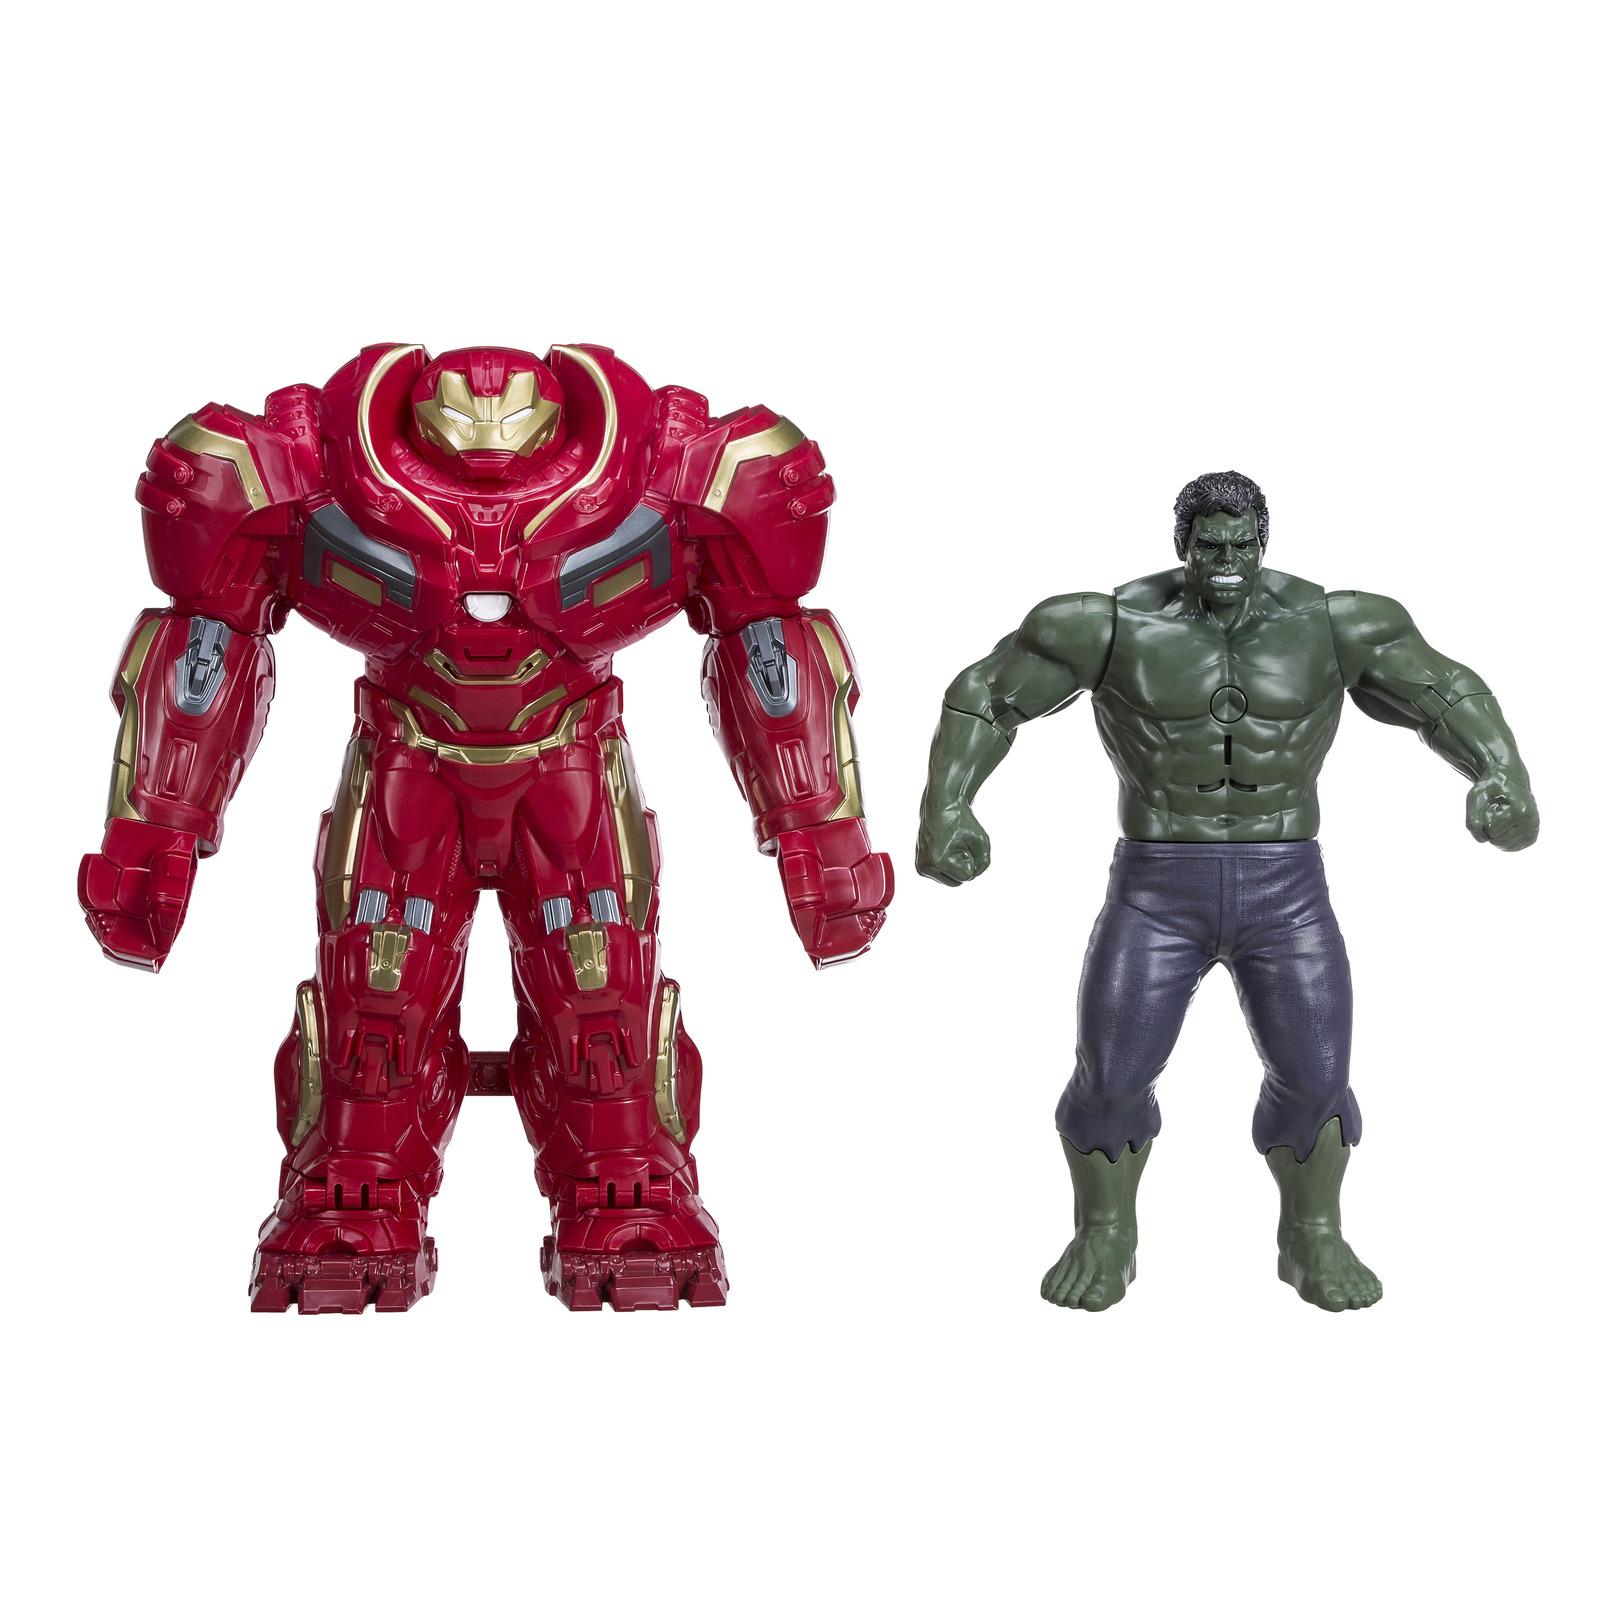 Avengers Infinity War: Hulk Buster image